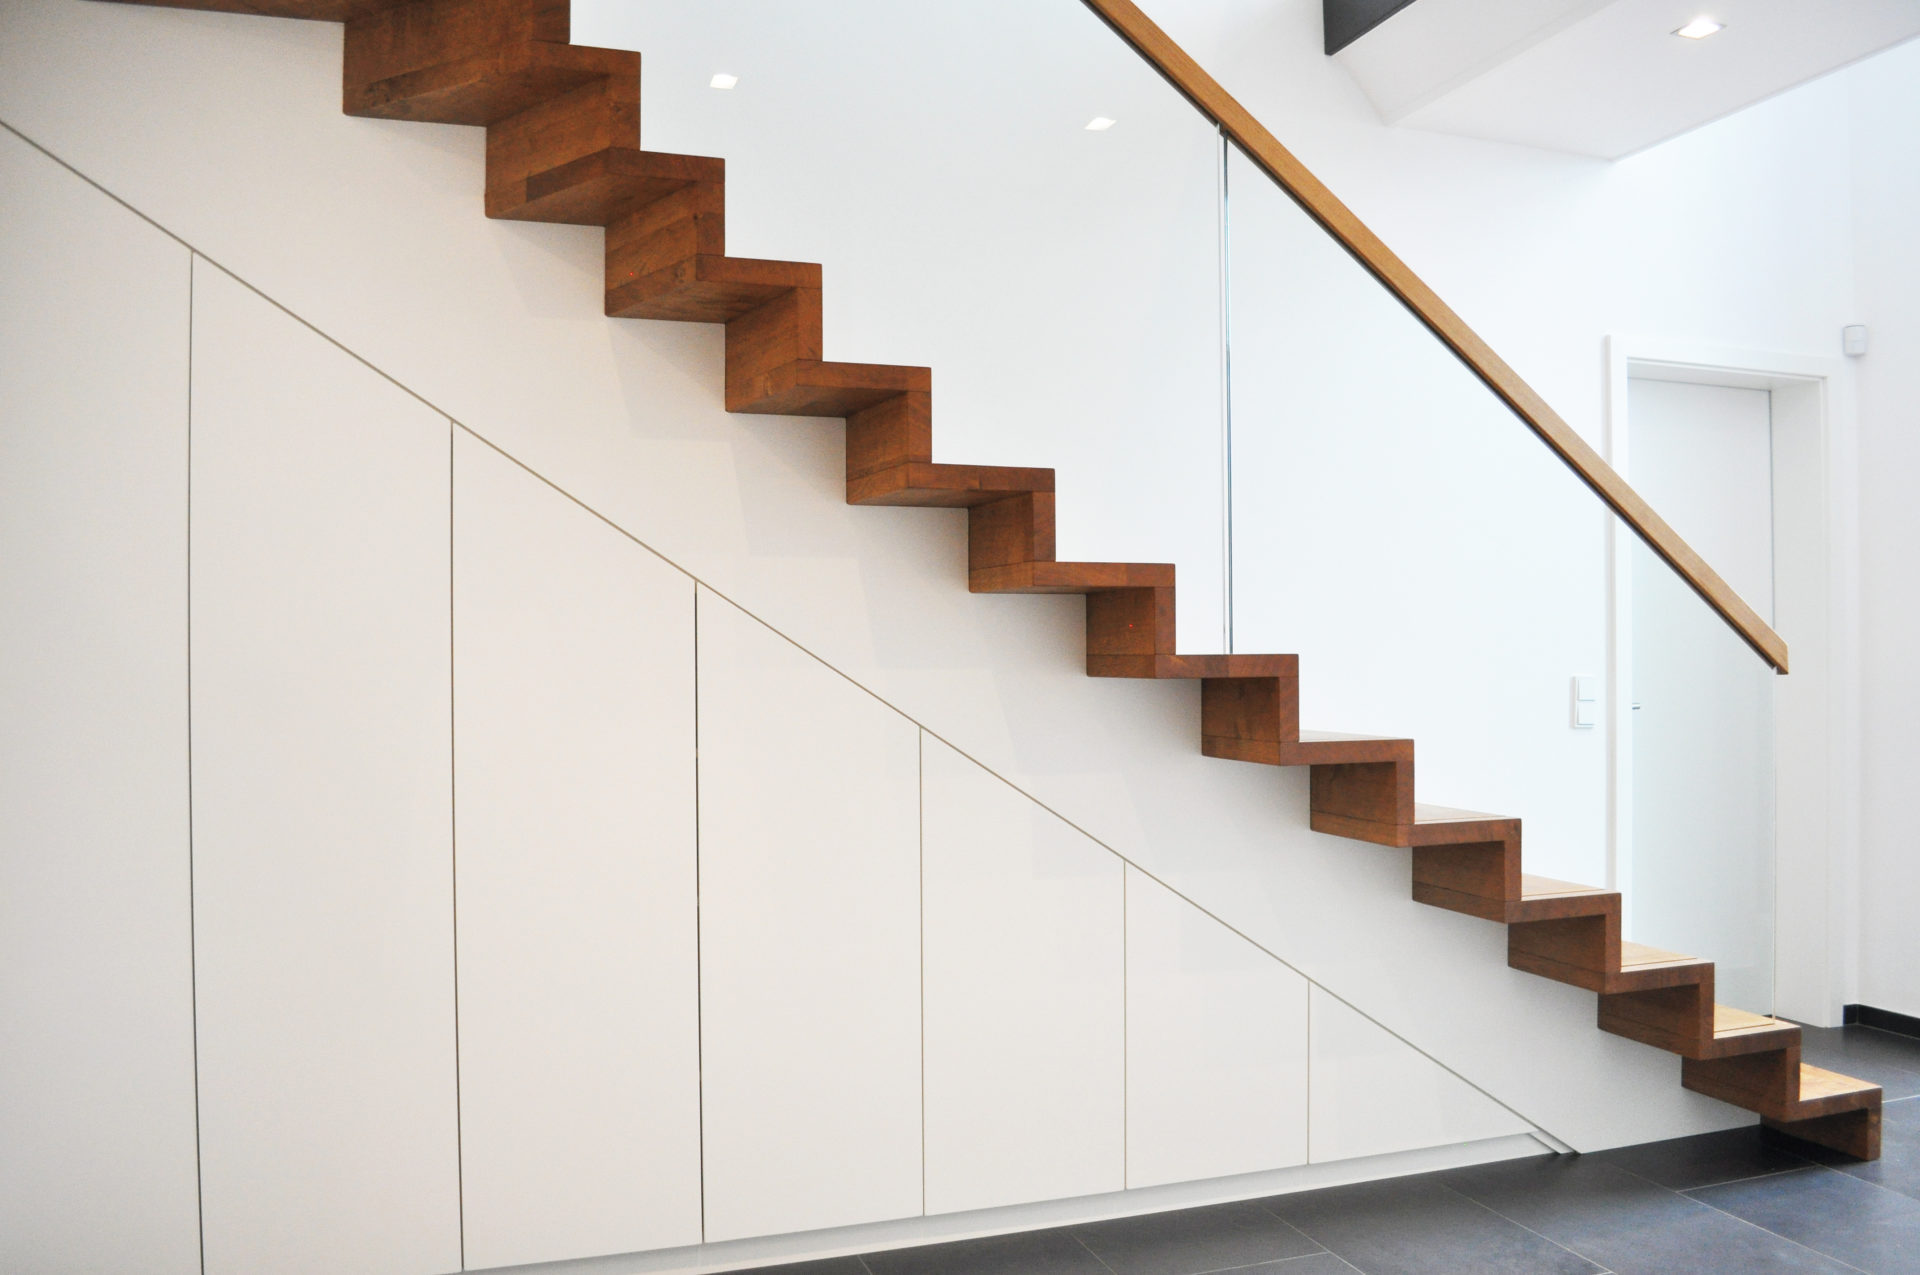 Unterbautreppen Treppenschranke Treppenbau Leisen Treppen